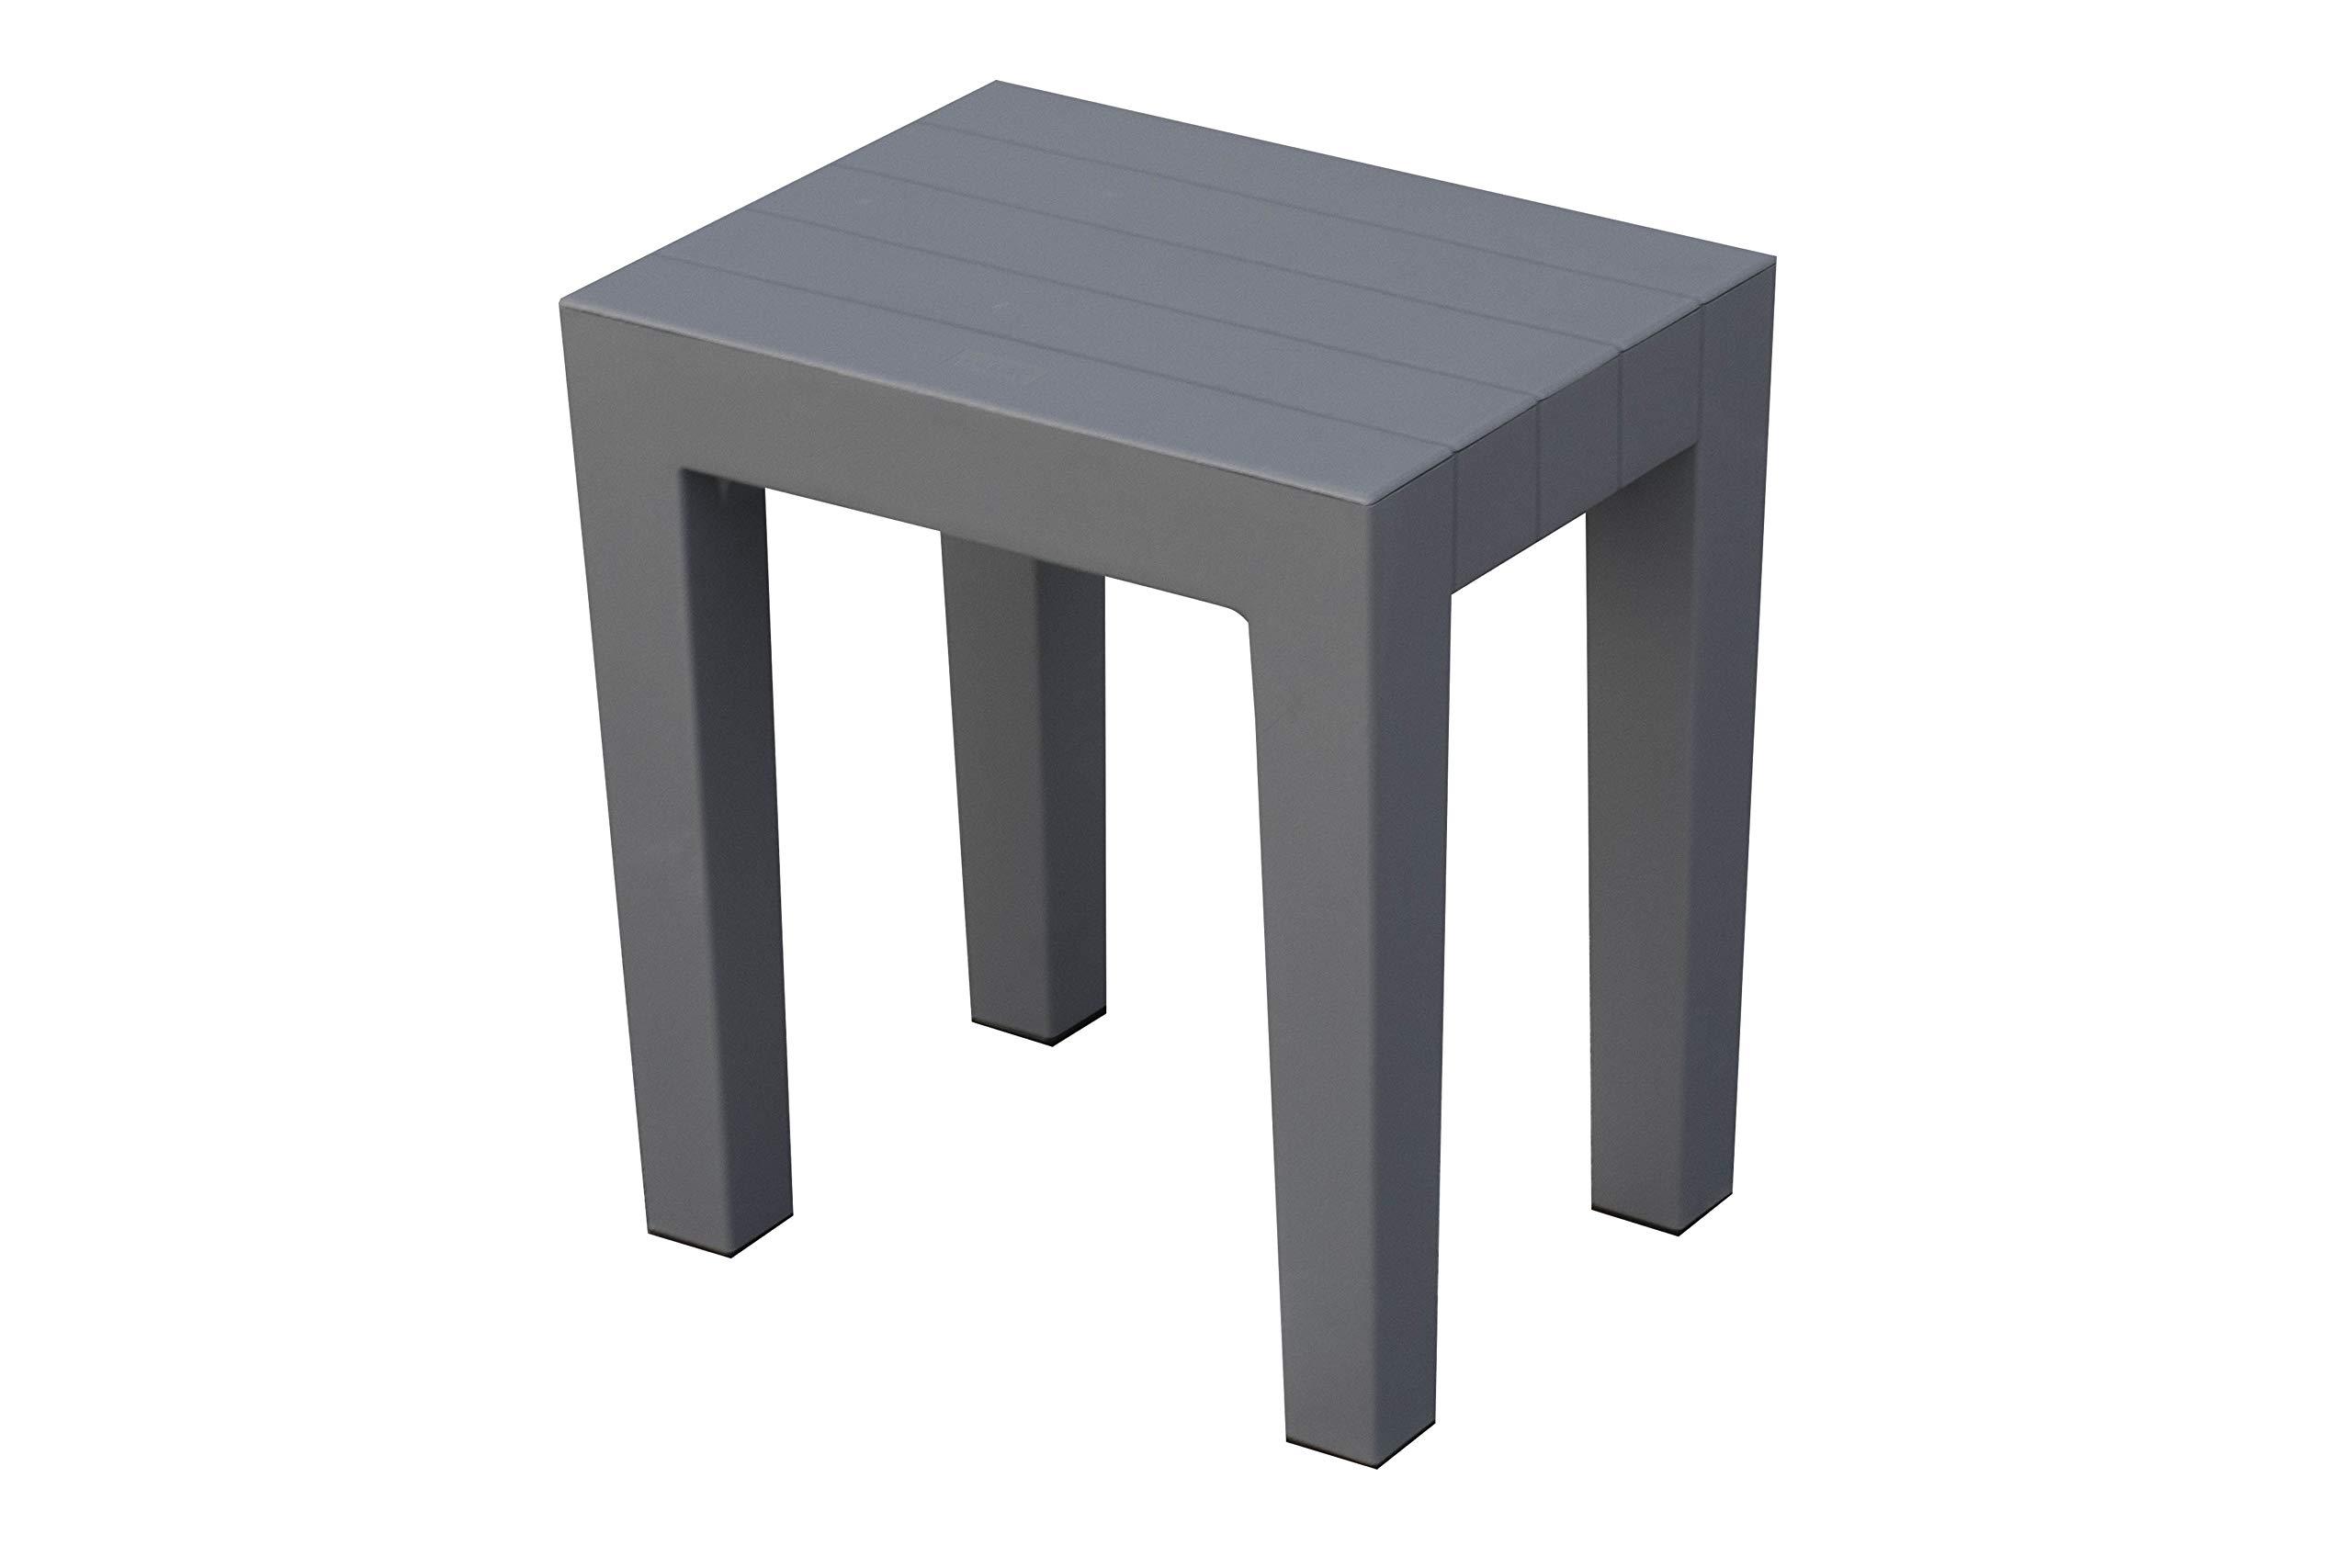 DesignByIntent Polypropylene Shower Stool in Gray